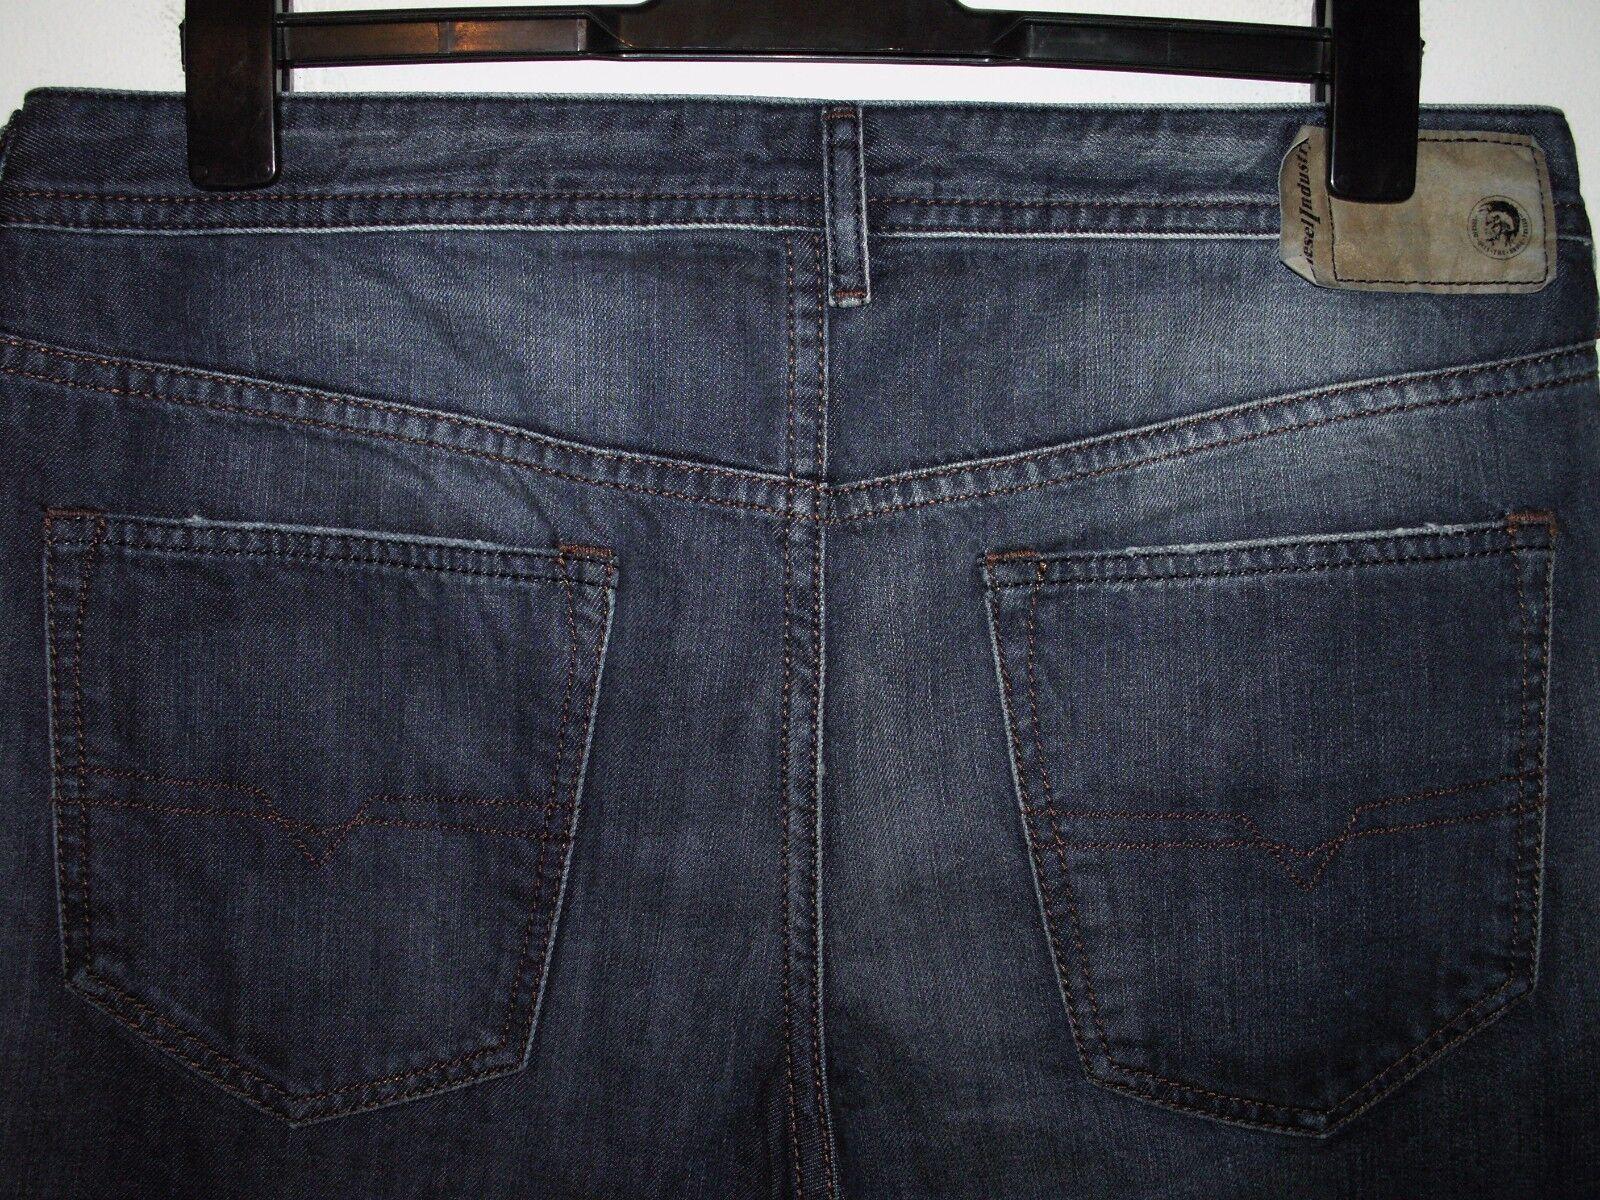 Diesel buster regular slim-tapered fit jeans wash 0838B W36 L30 (a3164)